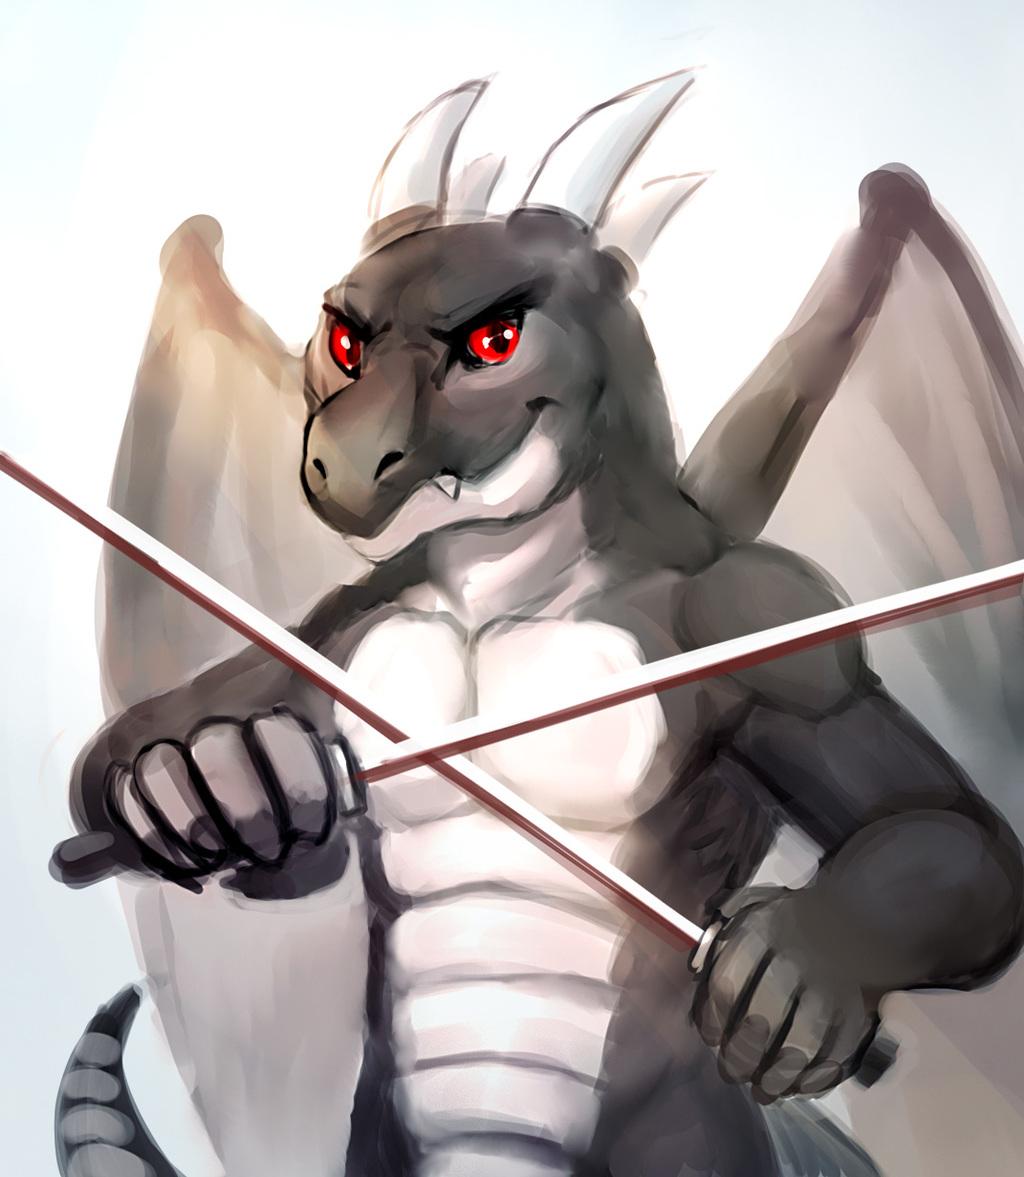 Nightdragon: Crossed Swords by Cheetahpaws